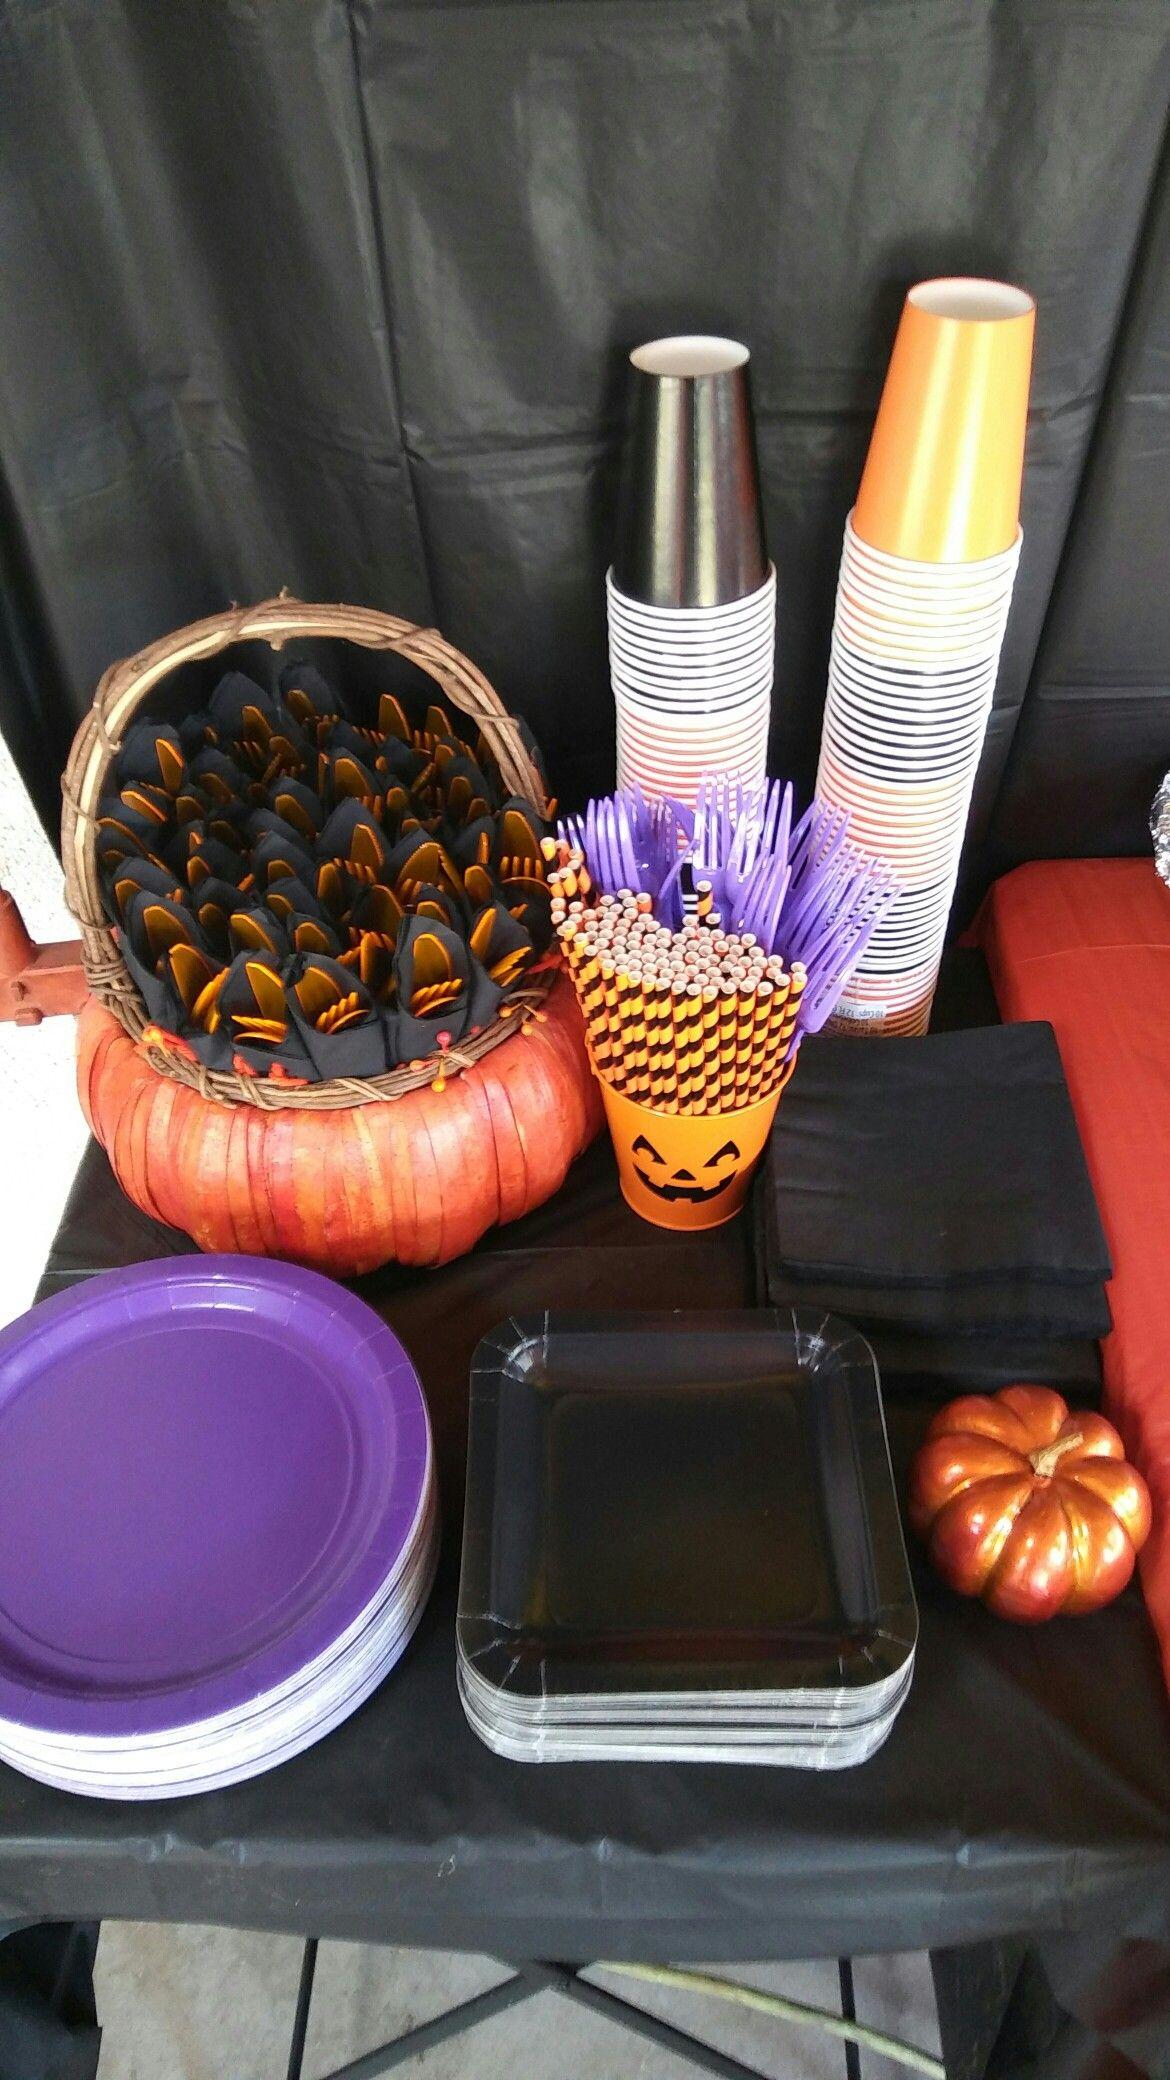 Halloween buffet table - Halloween Party Fall Baby Shower Plasticware Silverware Straws Orange Black Purple Pumpkin Birthday Buffet Table Decor